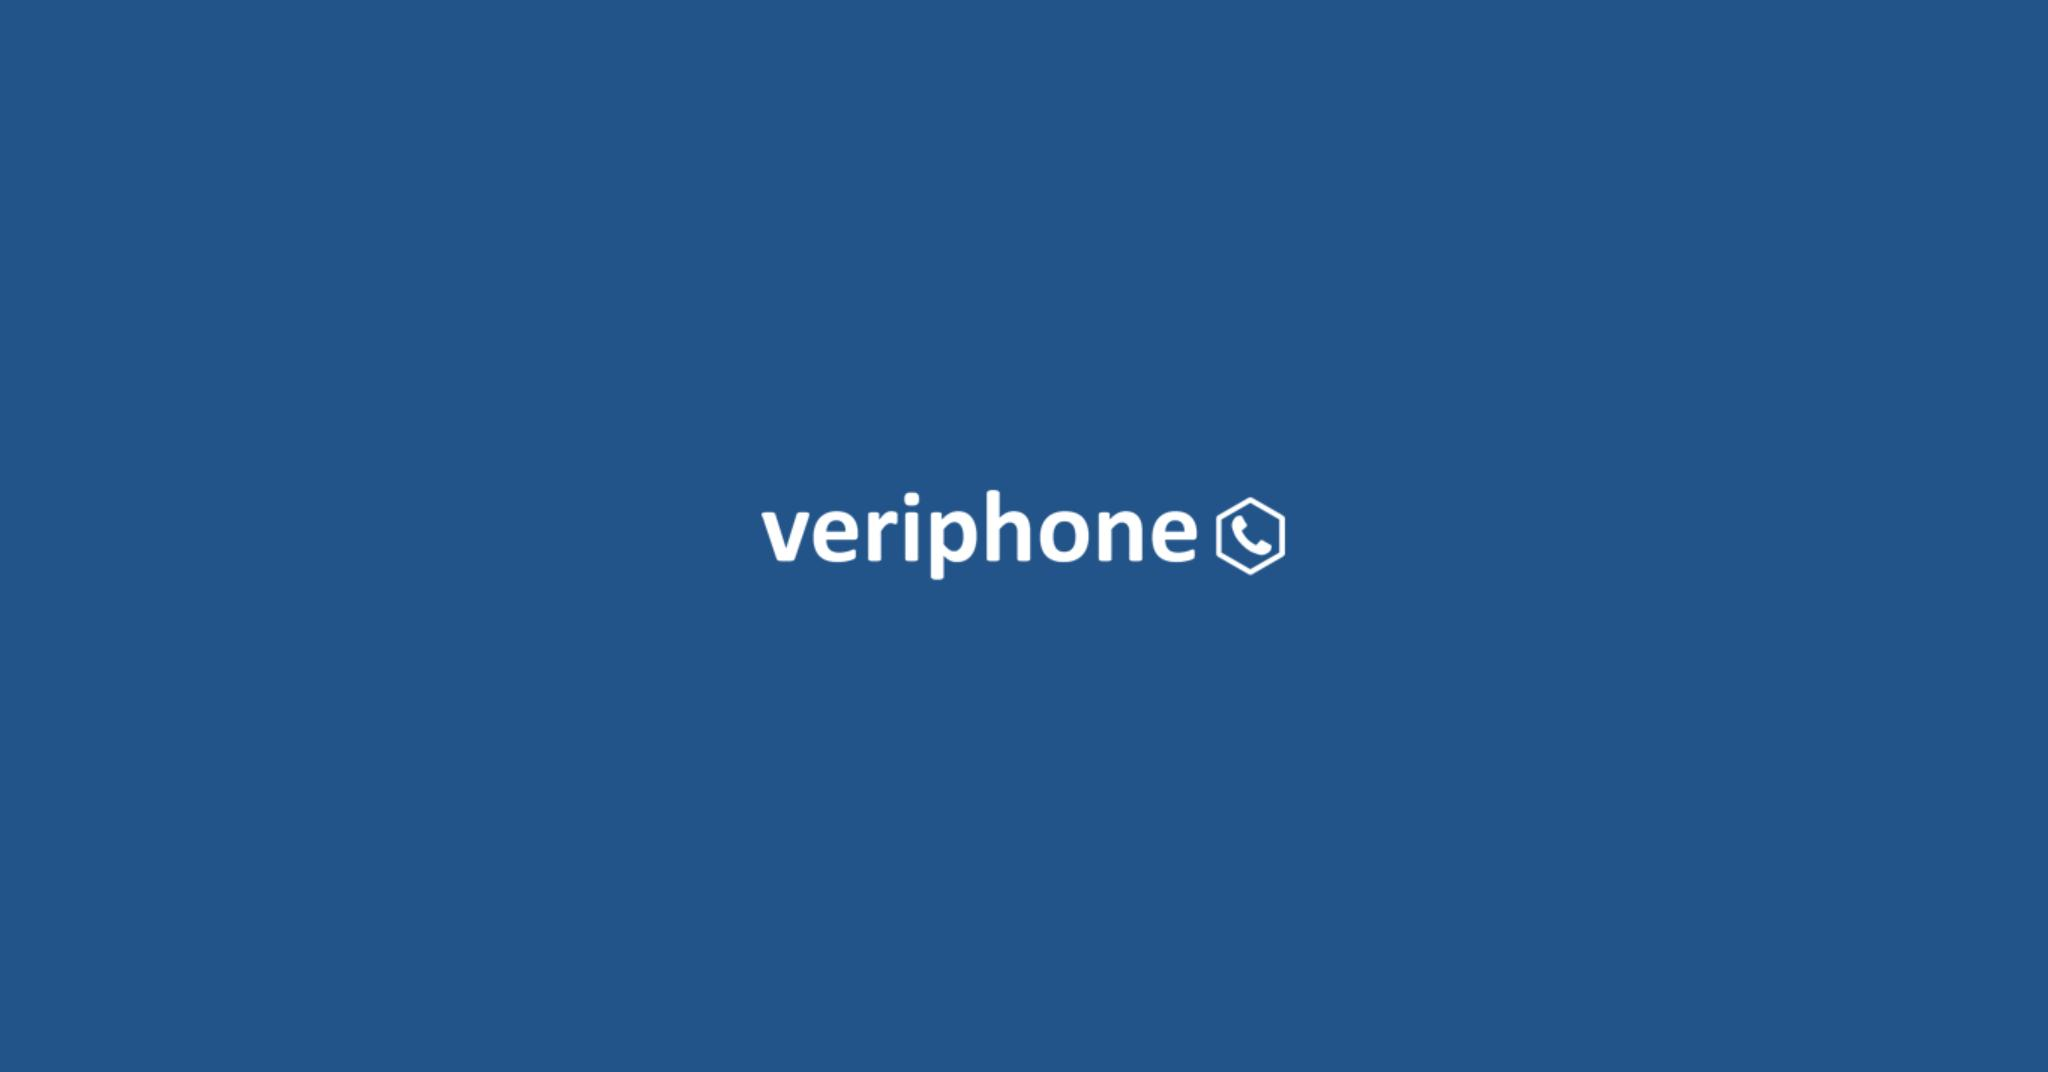 Veriphone